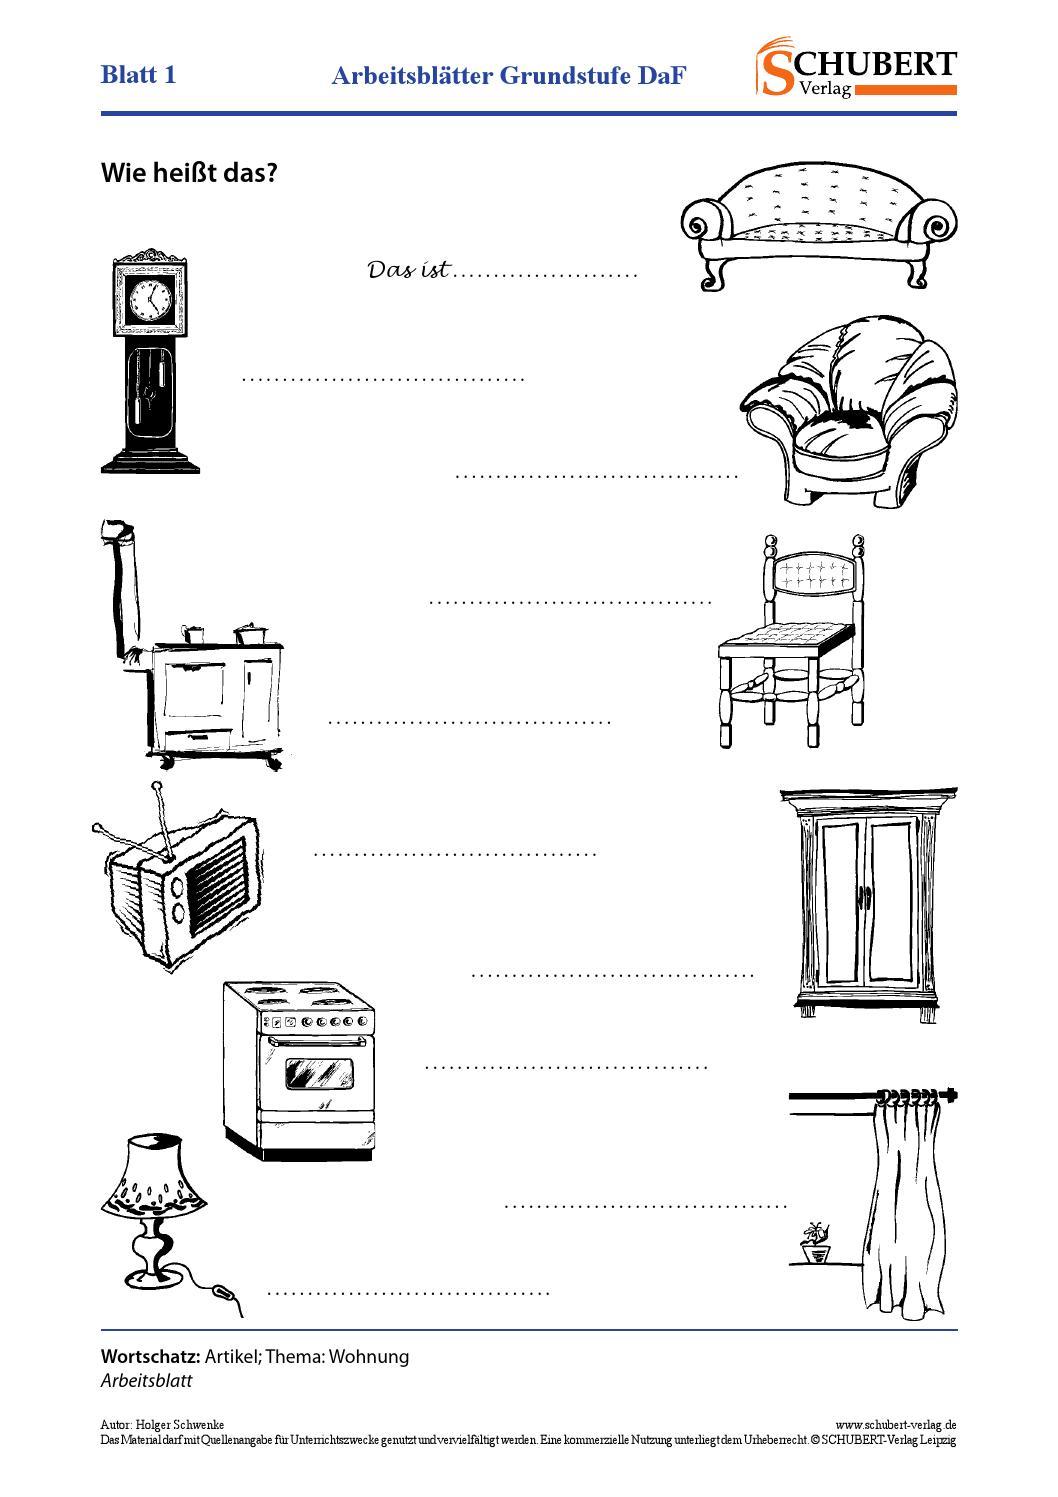 arbeitsblatt001 099 pdf. Black Bedroom Furniture Sets. Home Design Ideas